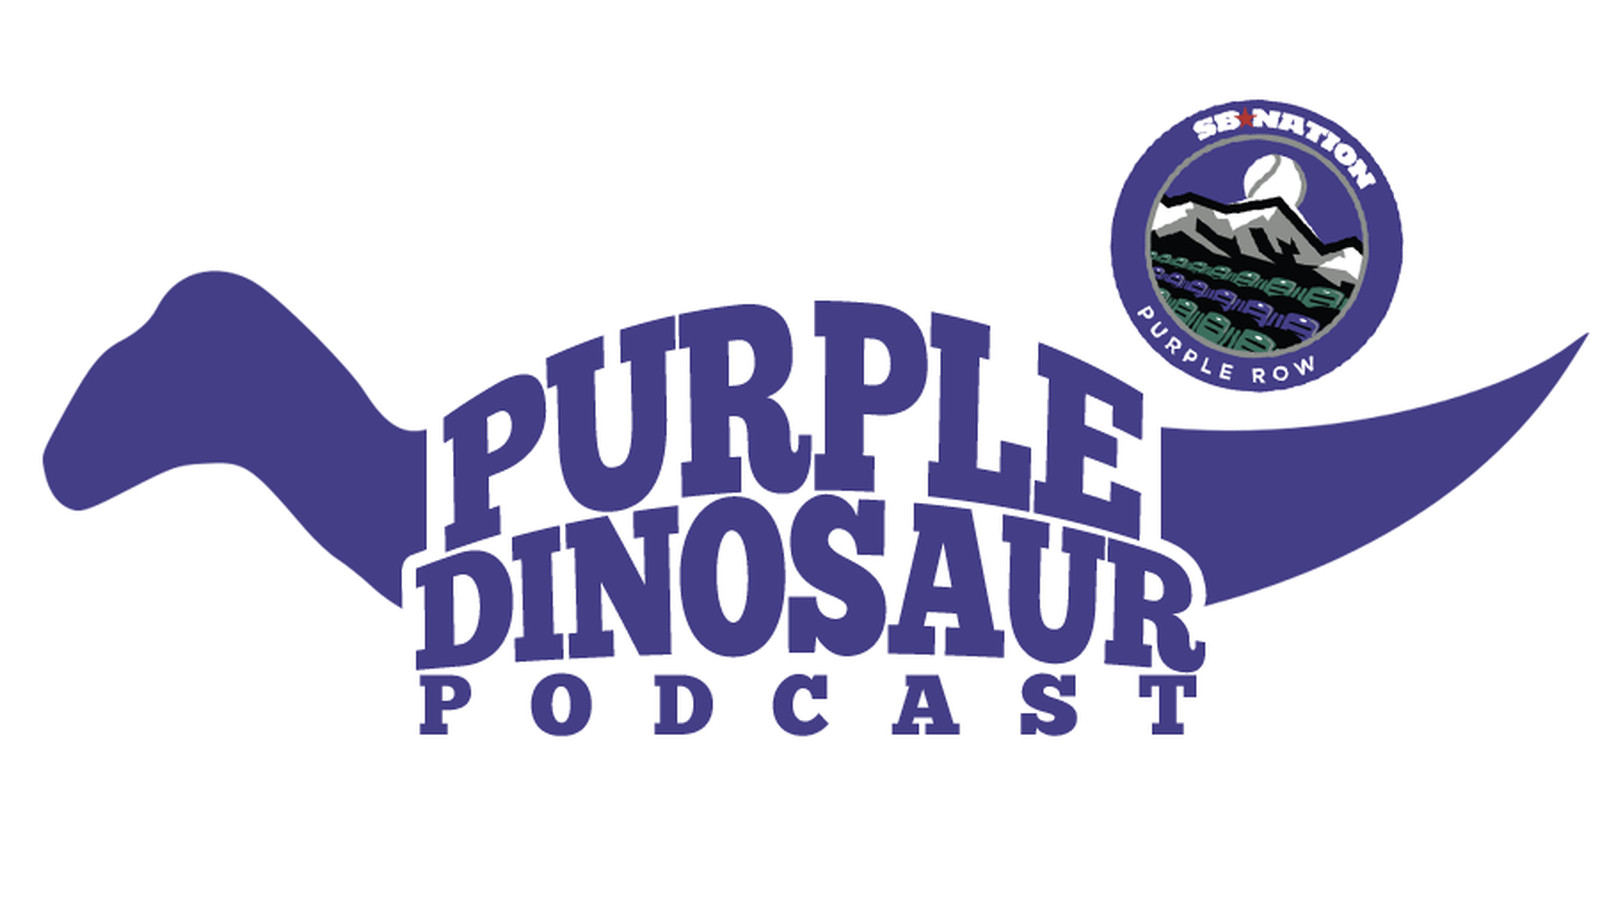 Purple-row-podcast.0.0